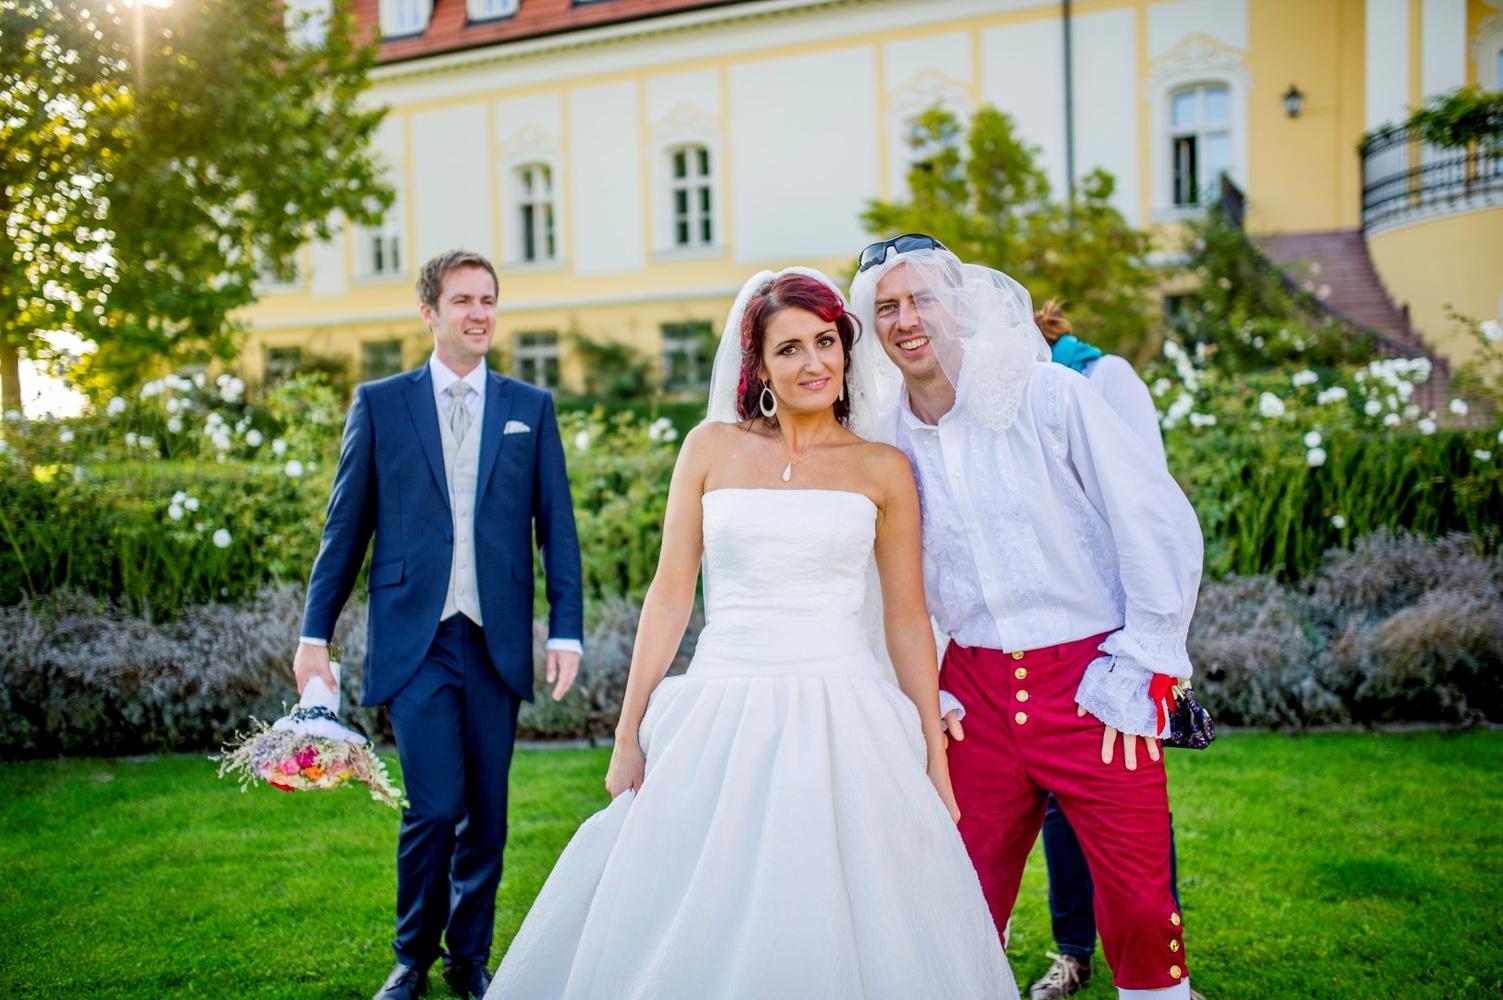 http://www.fotoz.sk/images/gallery-12/normal/svadba_hotel-chateau-bela_213.jpg